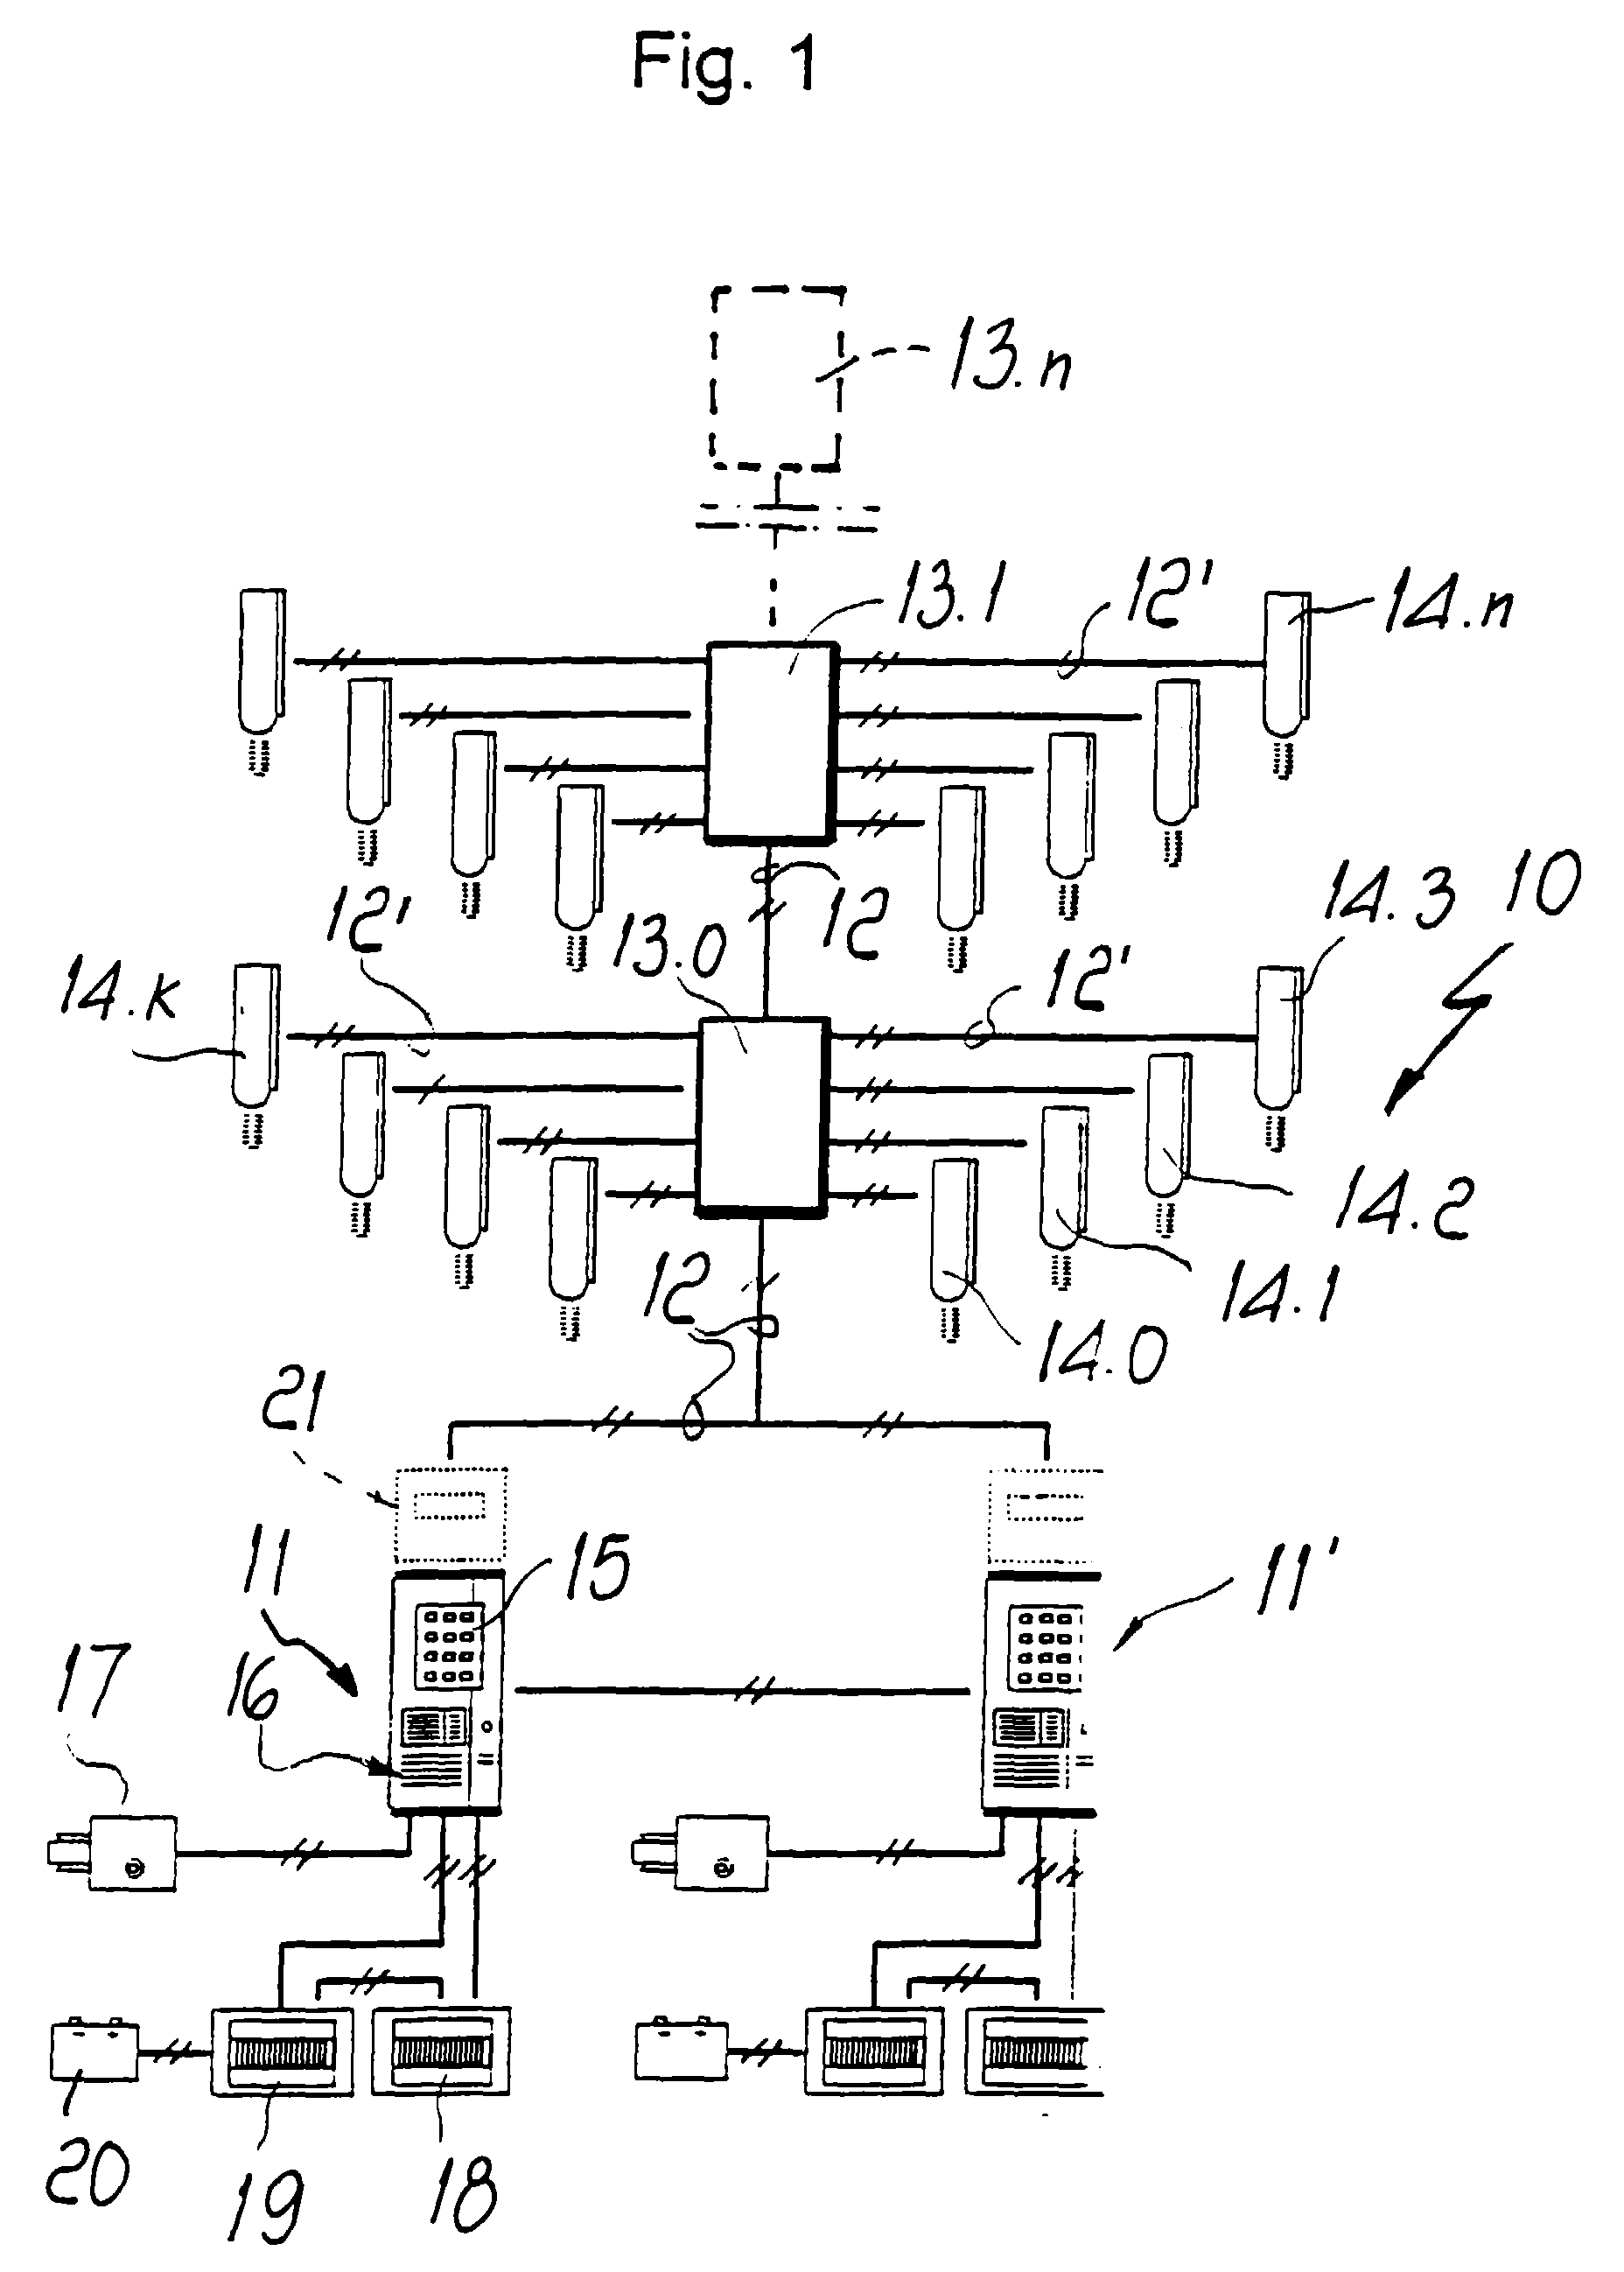 jeron call wiring diagram honda wiring diagram